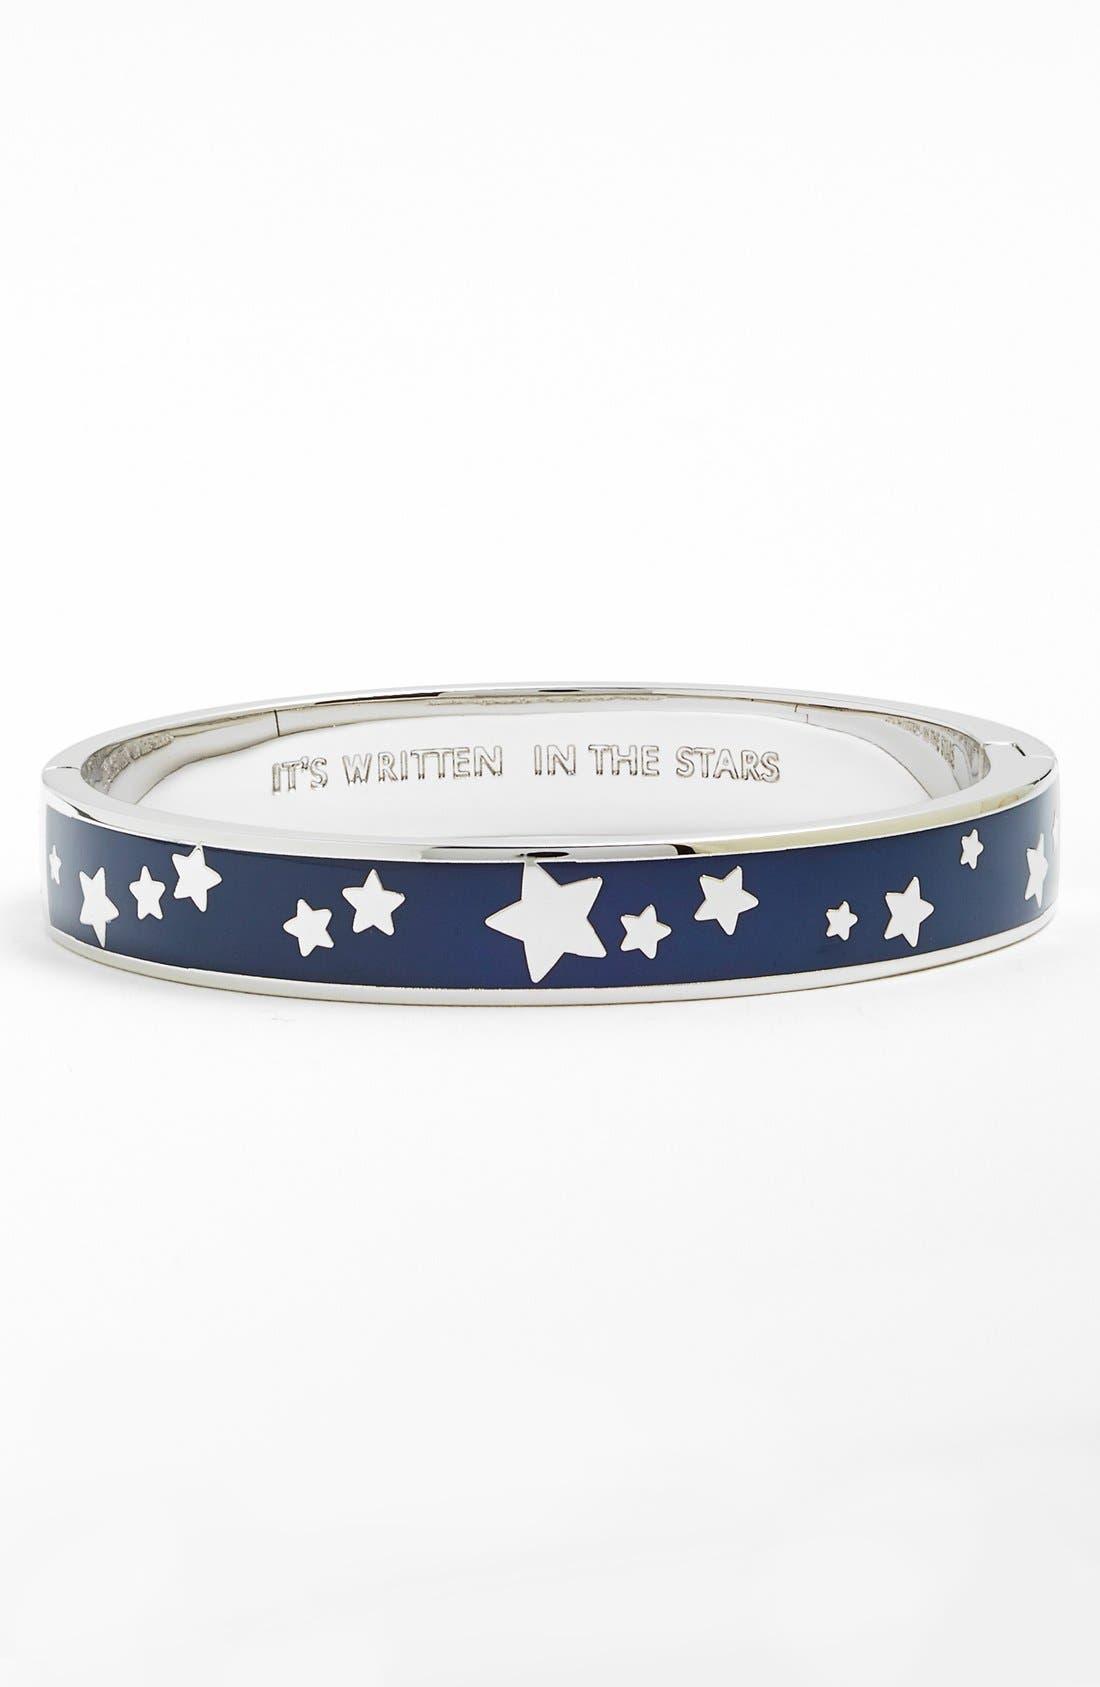 Main Image - kate spade new york 'idiom - it's written in the stars' enamel bangle